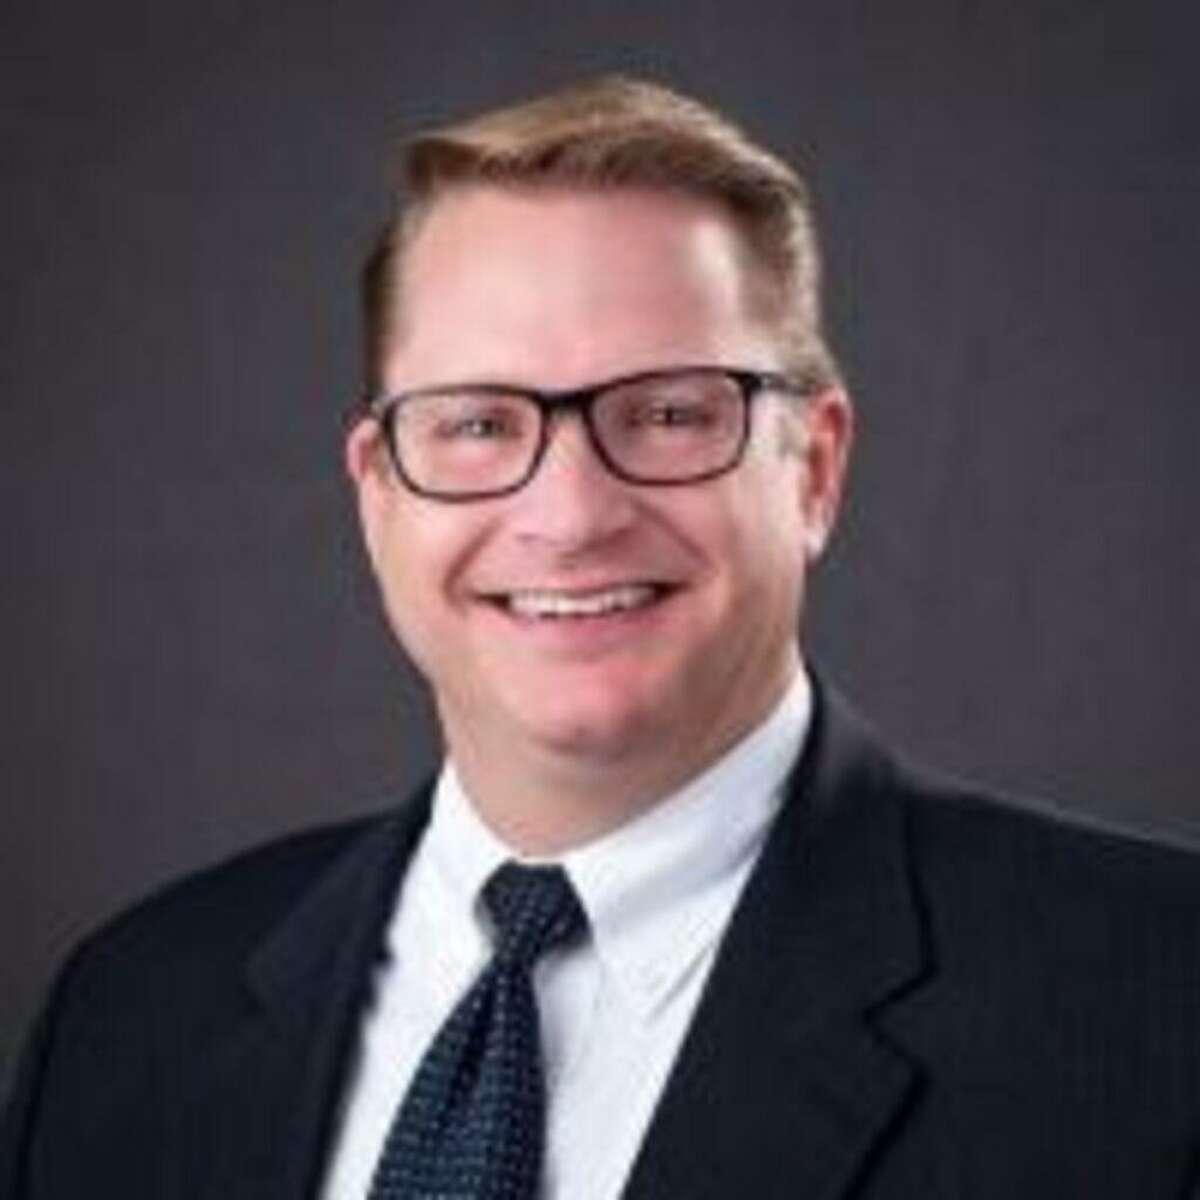 East Hampton Town Manager David E. Cox